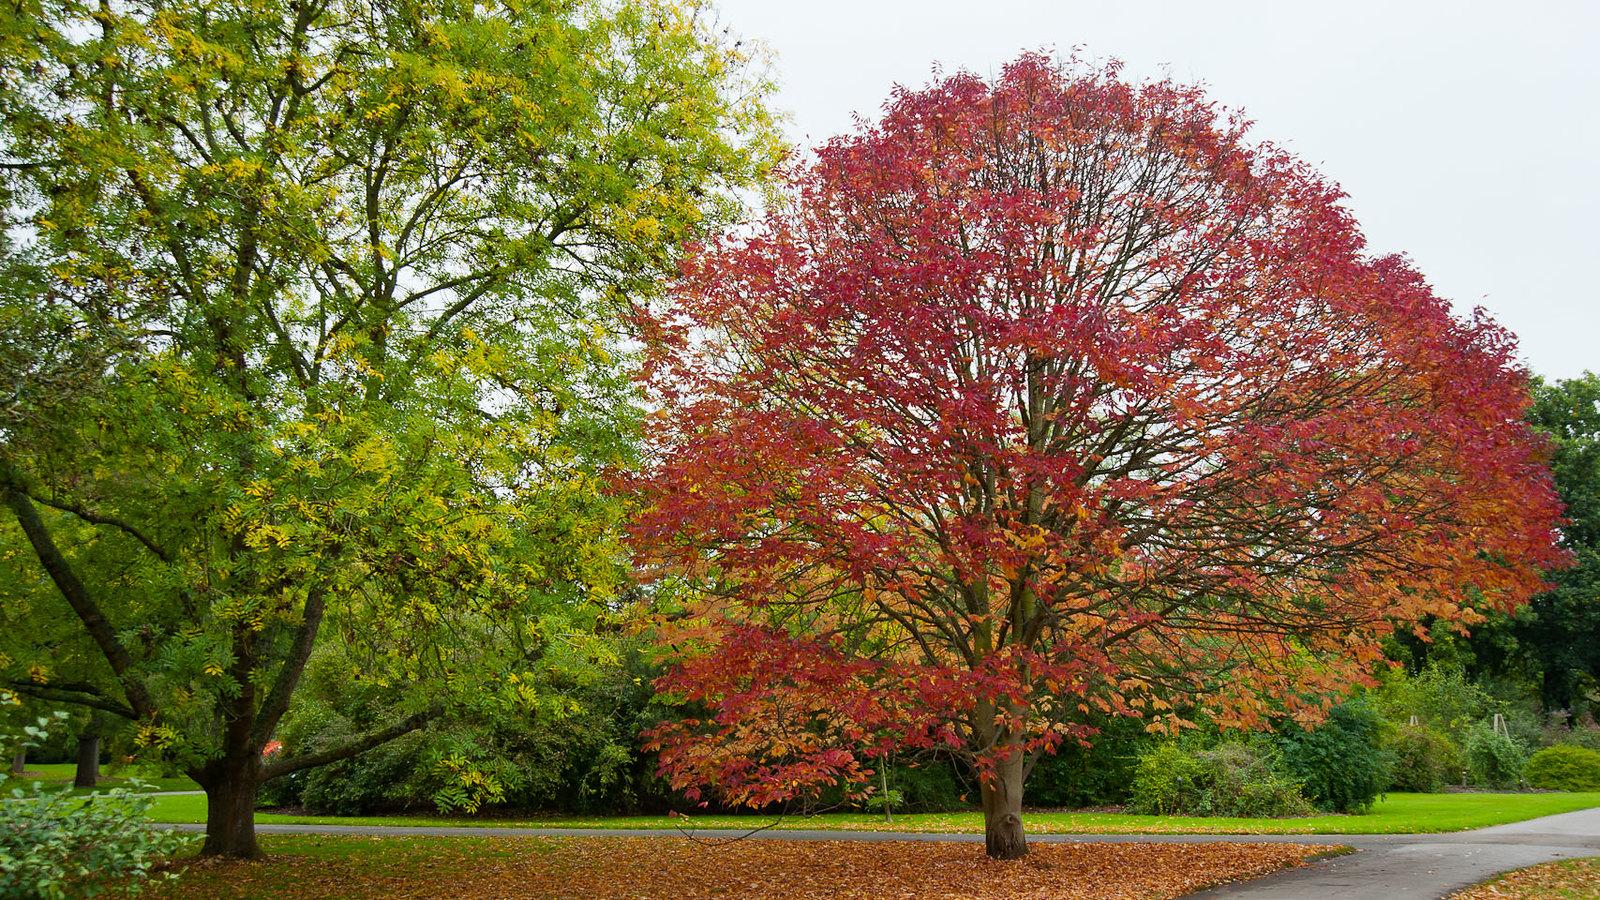 El fresno americano se vuelve rojo en otoño